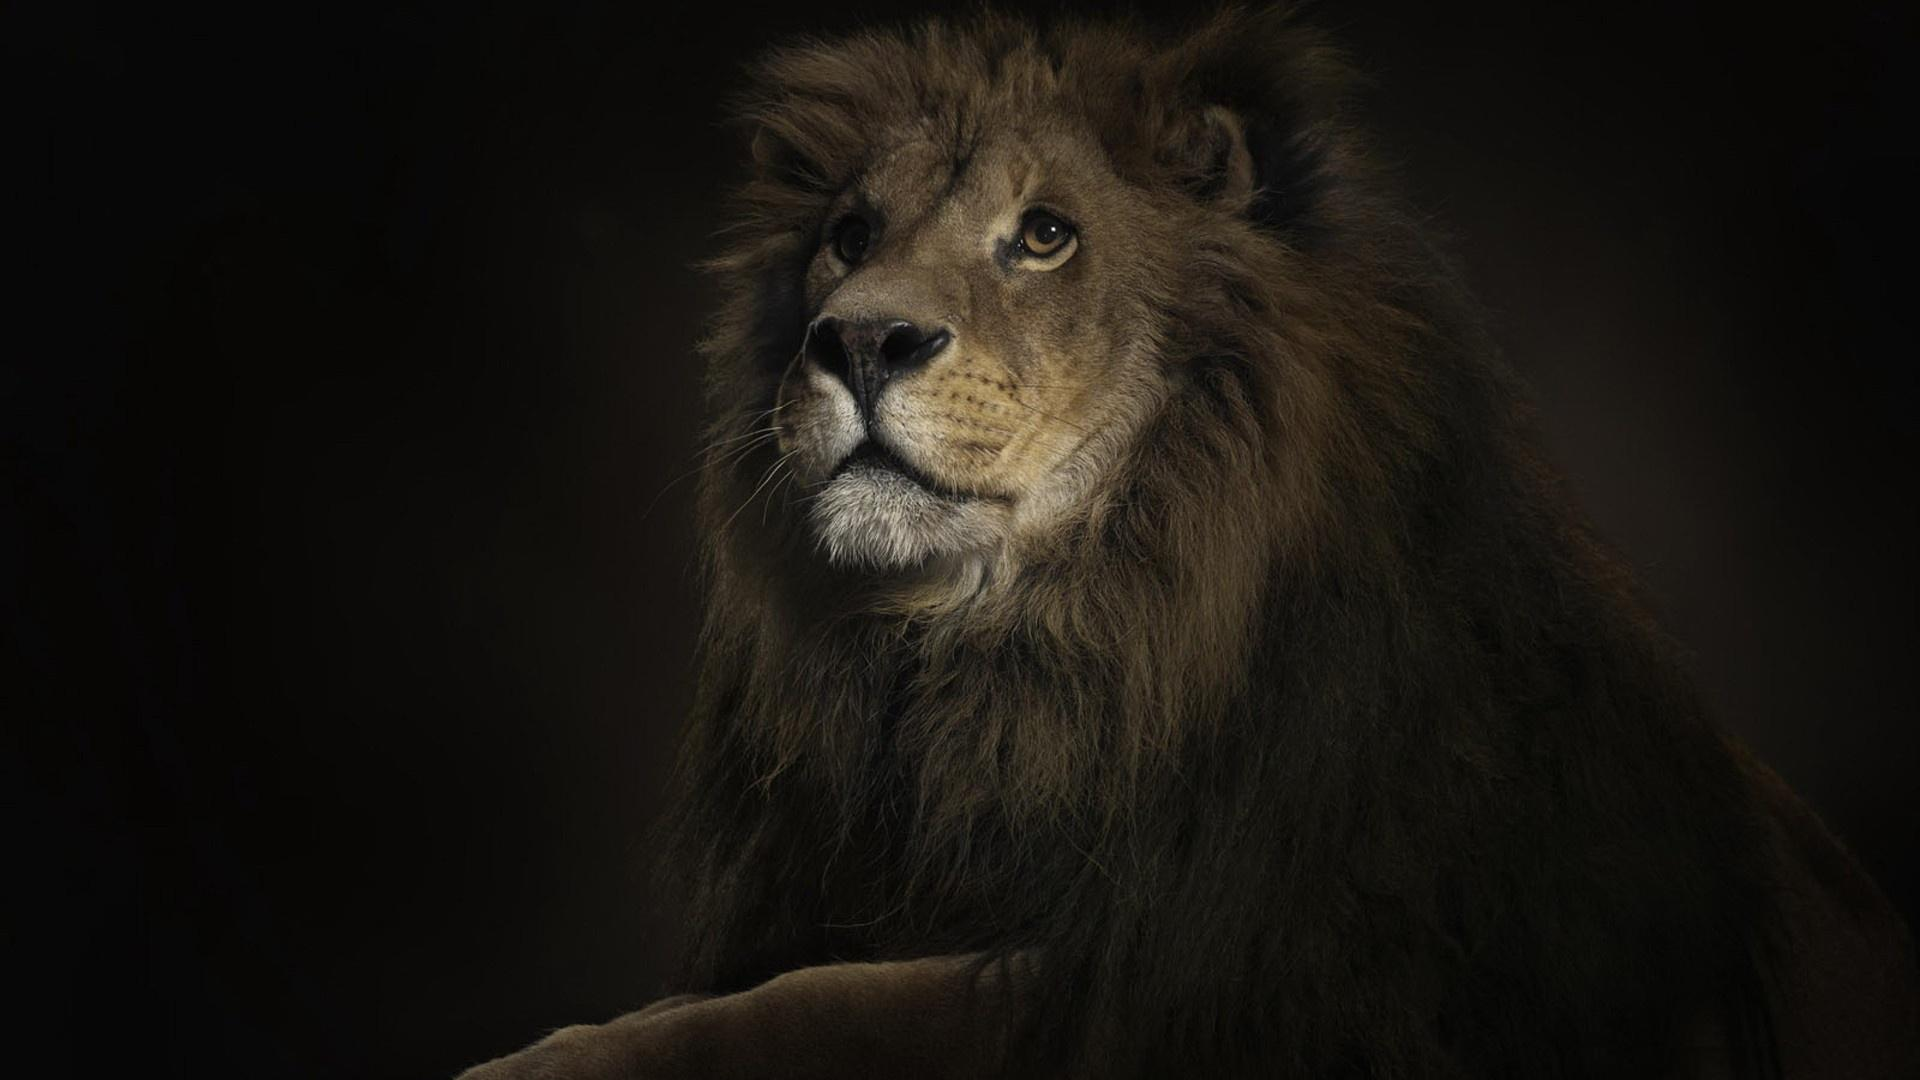 47 Lion Wallpaper Hd On Wallpapersafari